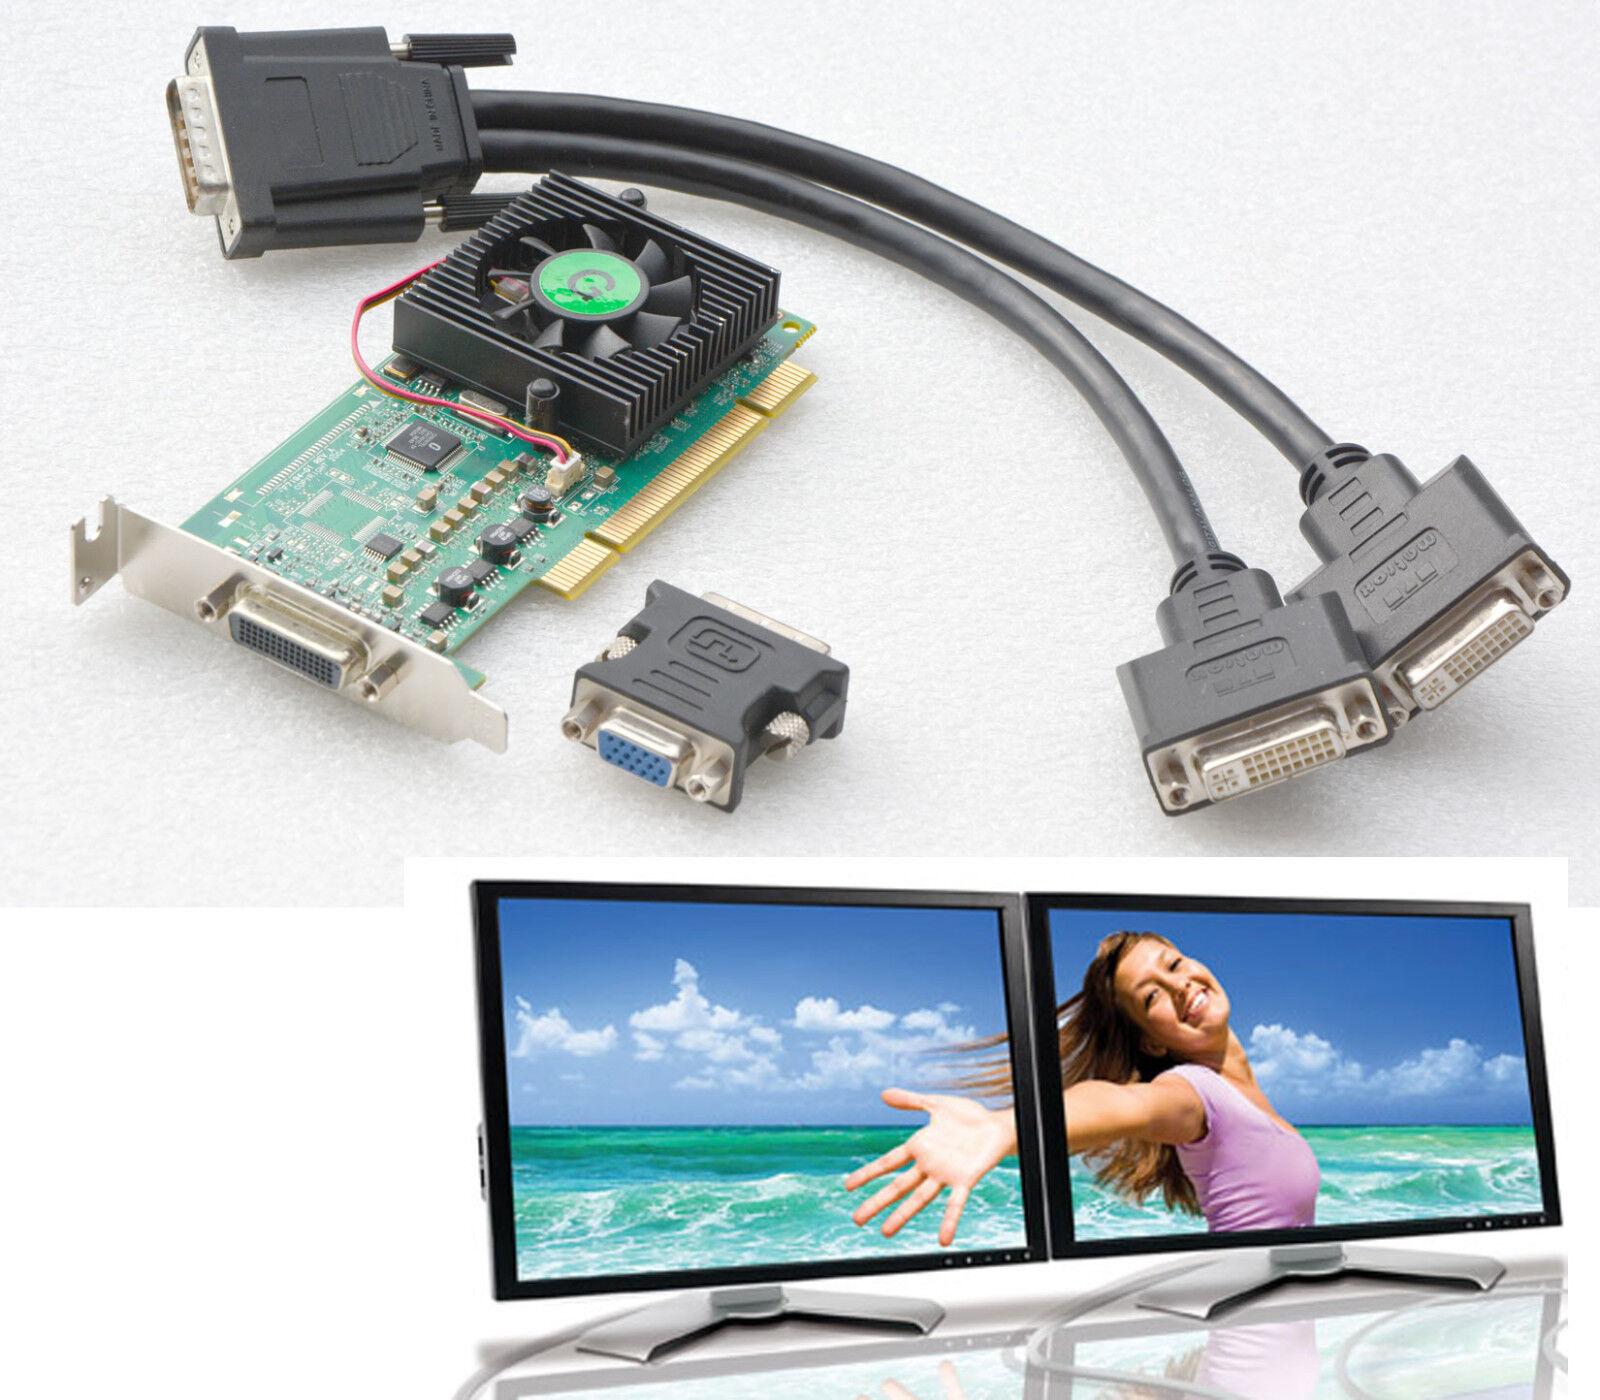 PCI Low Profile Graphic Card Matrox MILLENNIUM P650 Dual Head P65-MDDAP64F G24